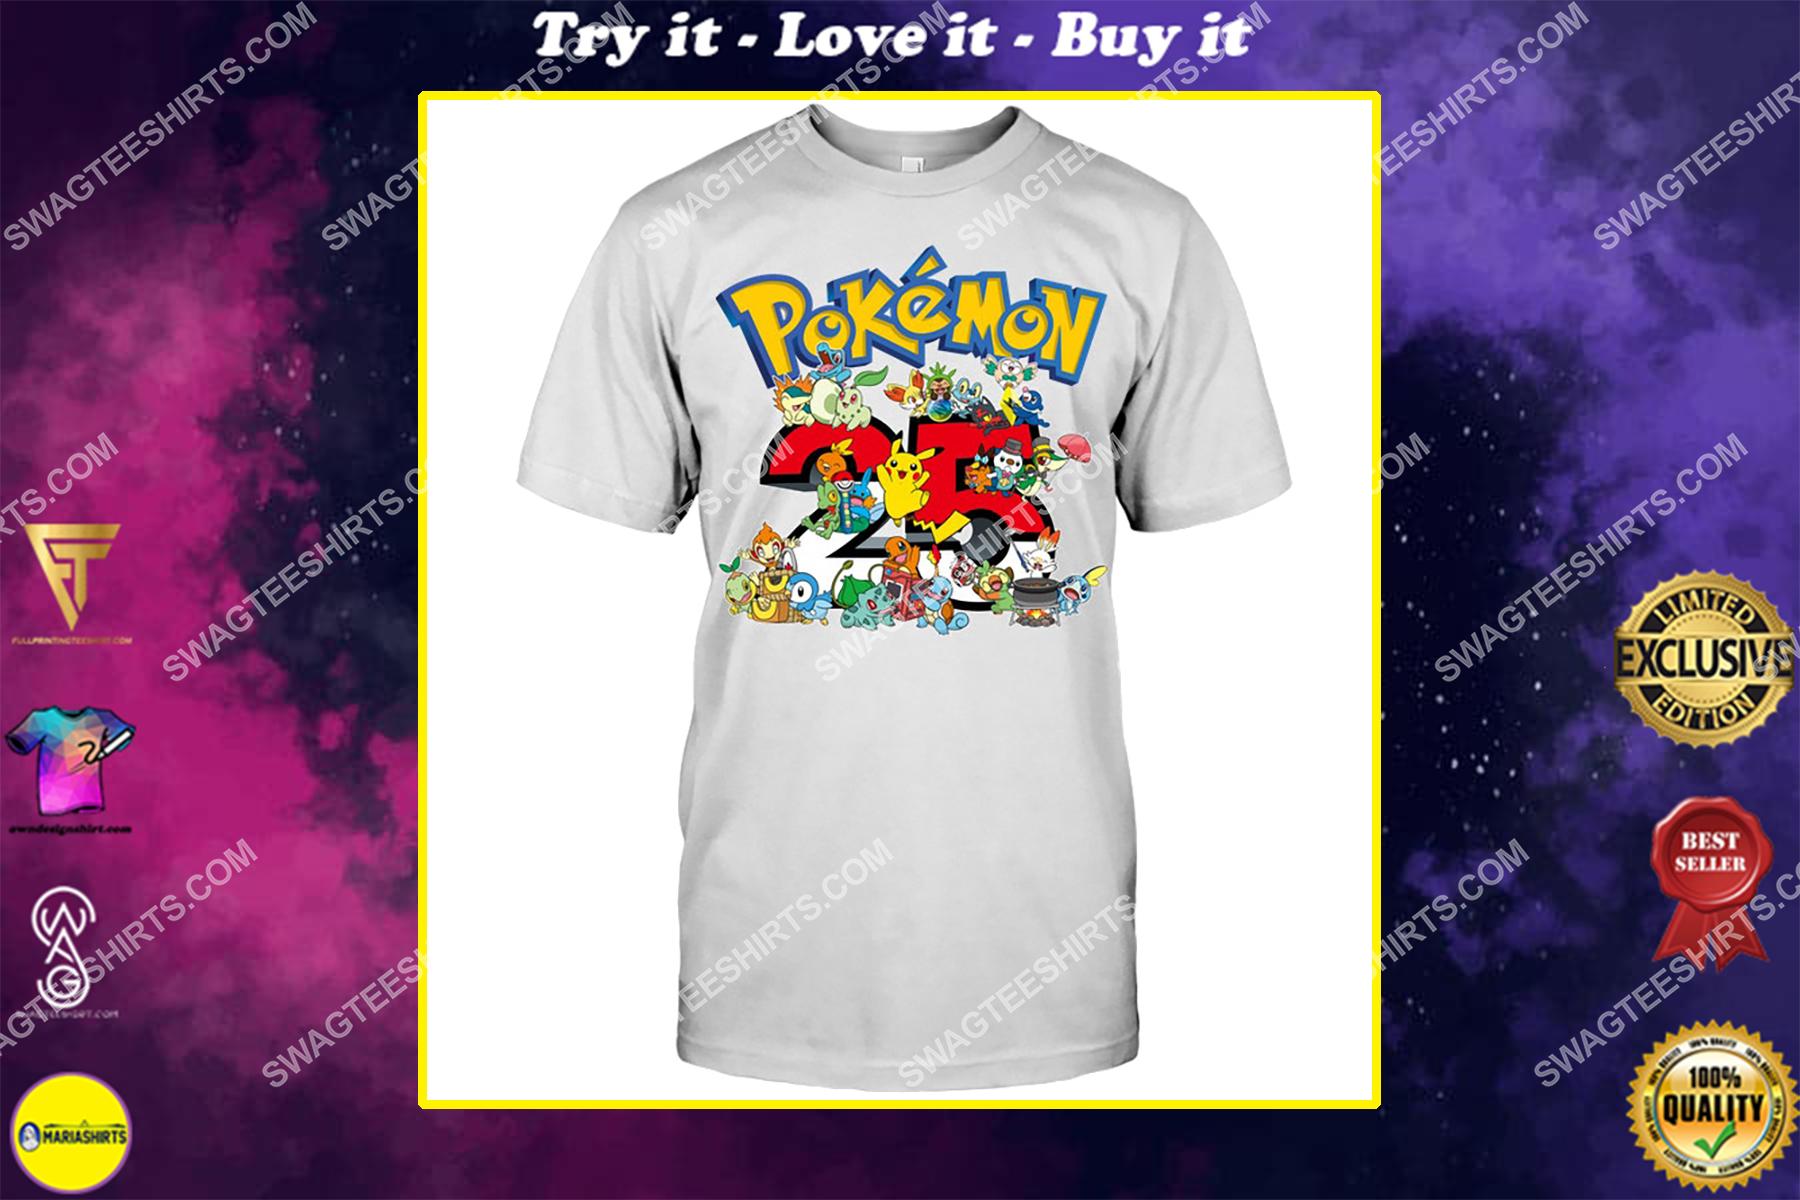 25th anniversary pokemon lover shirt